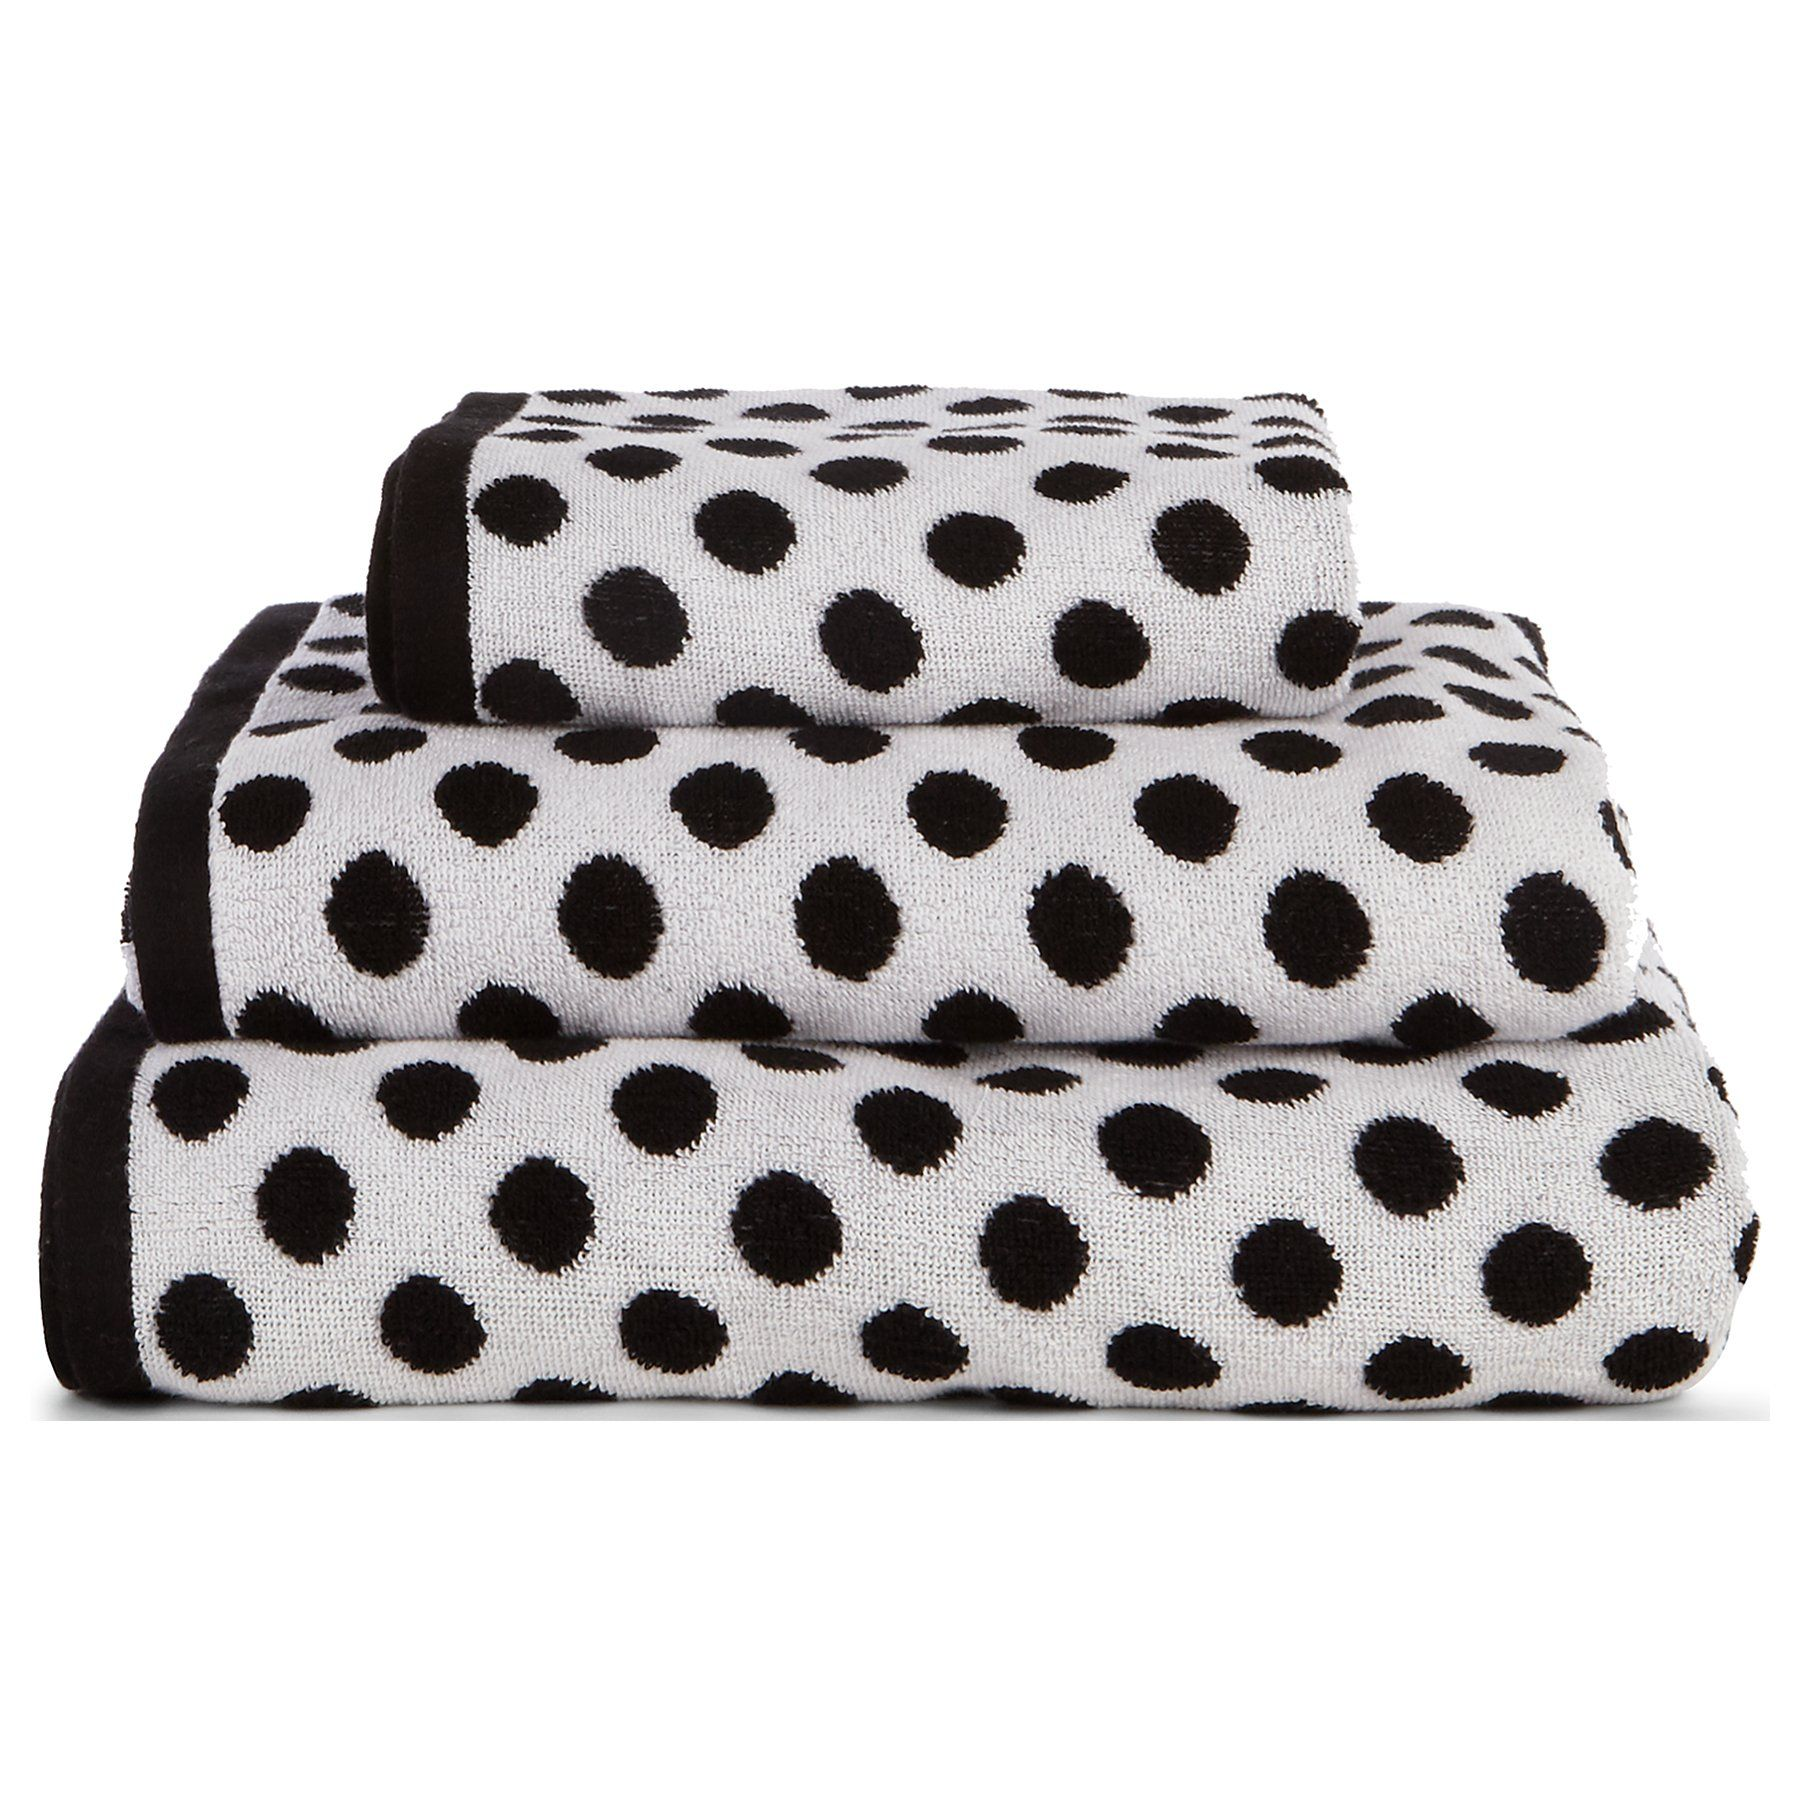 Polka Dot Cotton Towel Range | Towels & Bath Mats | George